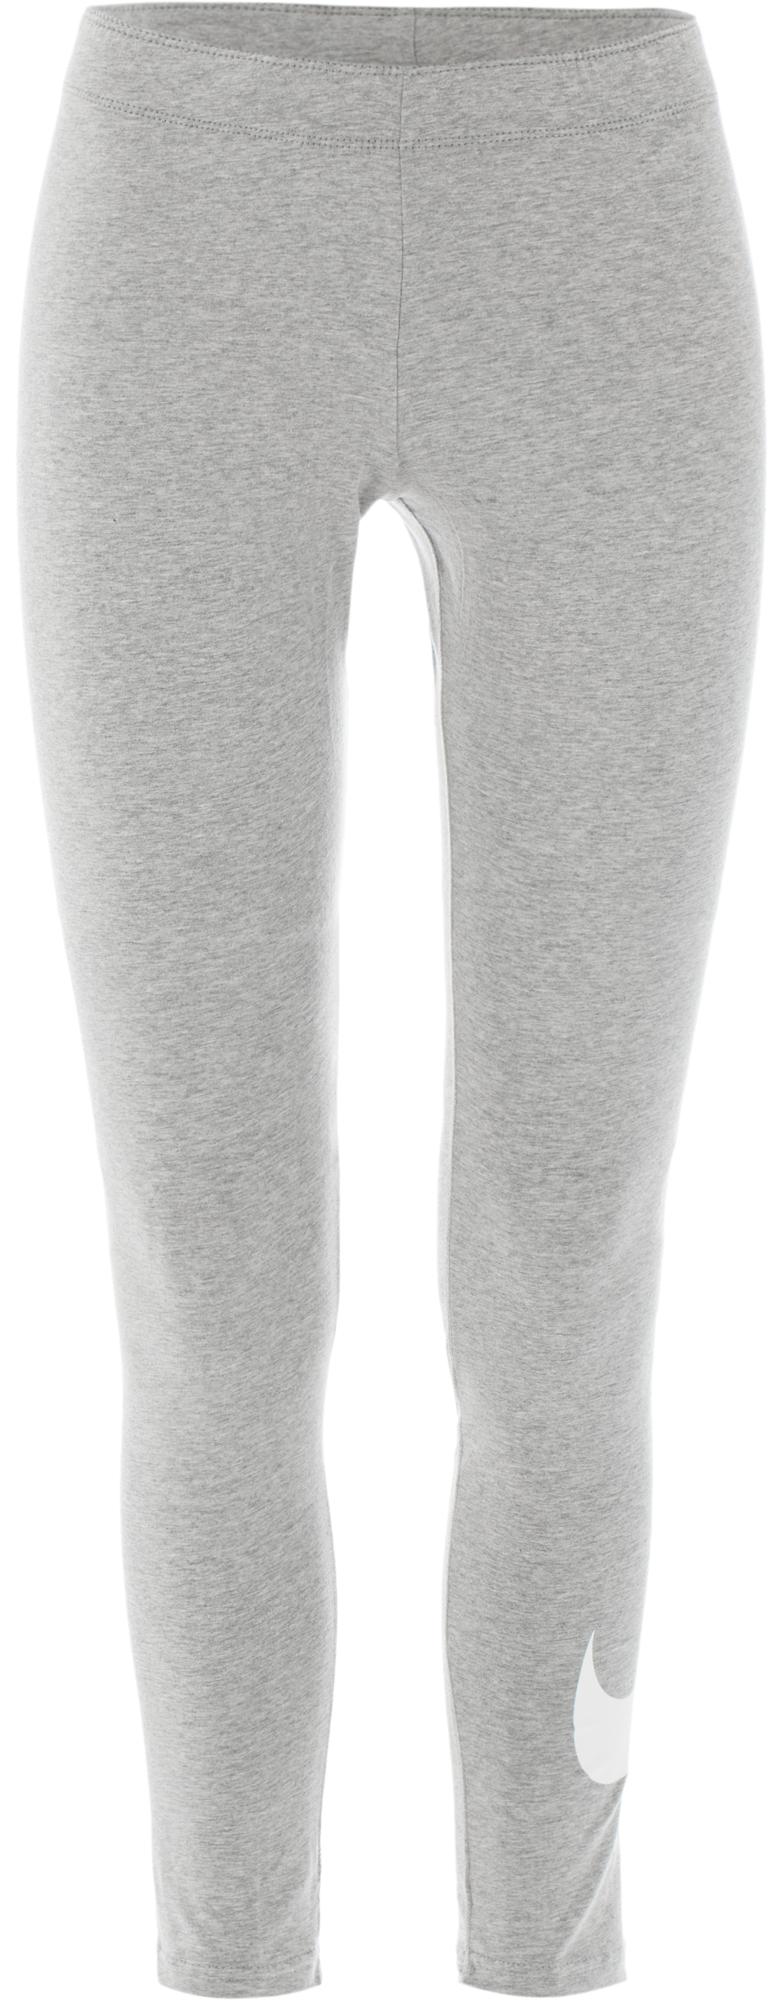 Nike Легинсы женские Sportswear, размер 46-48